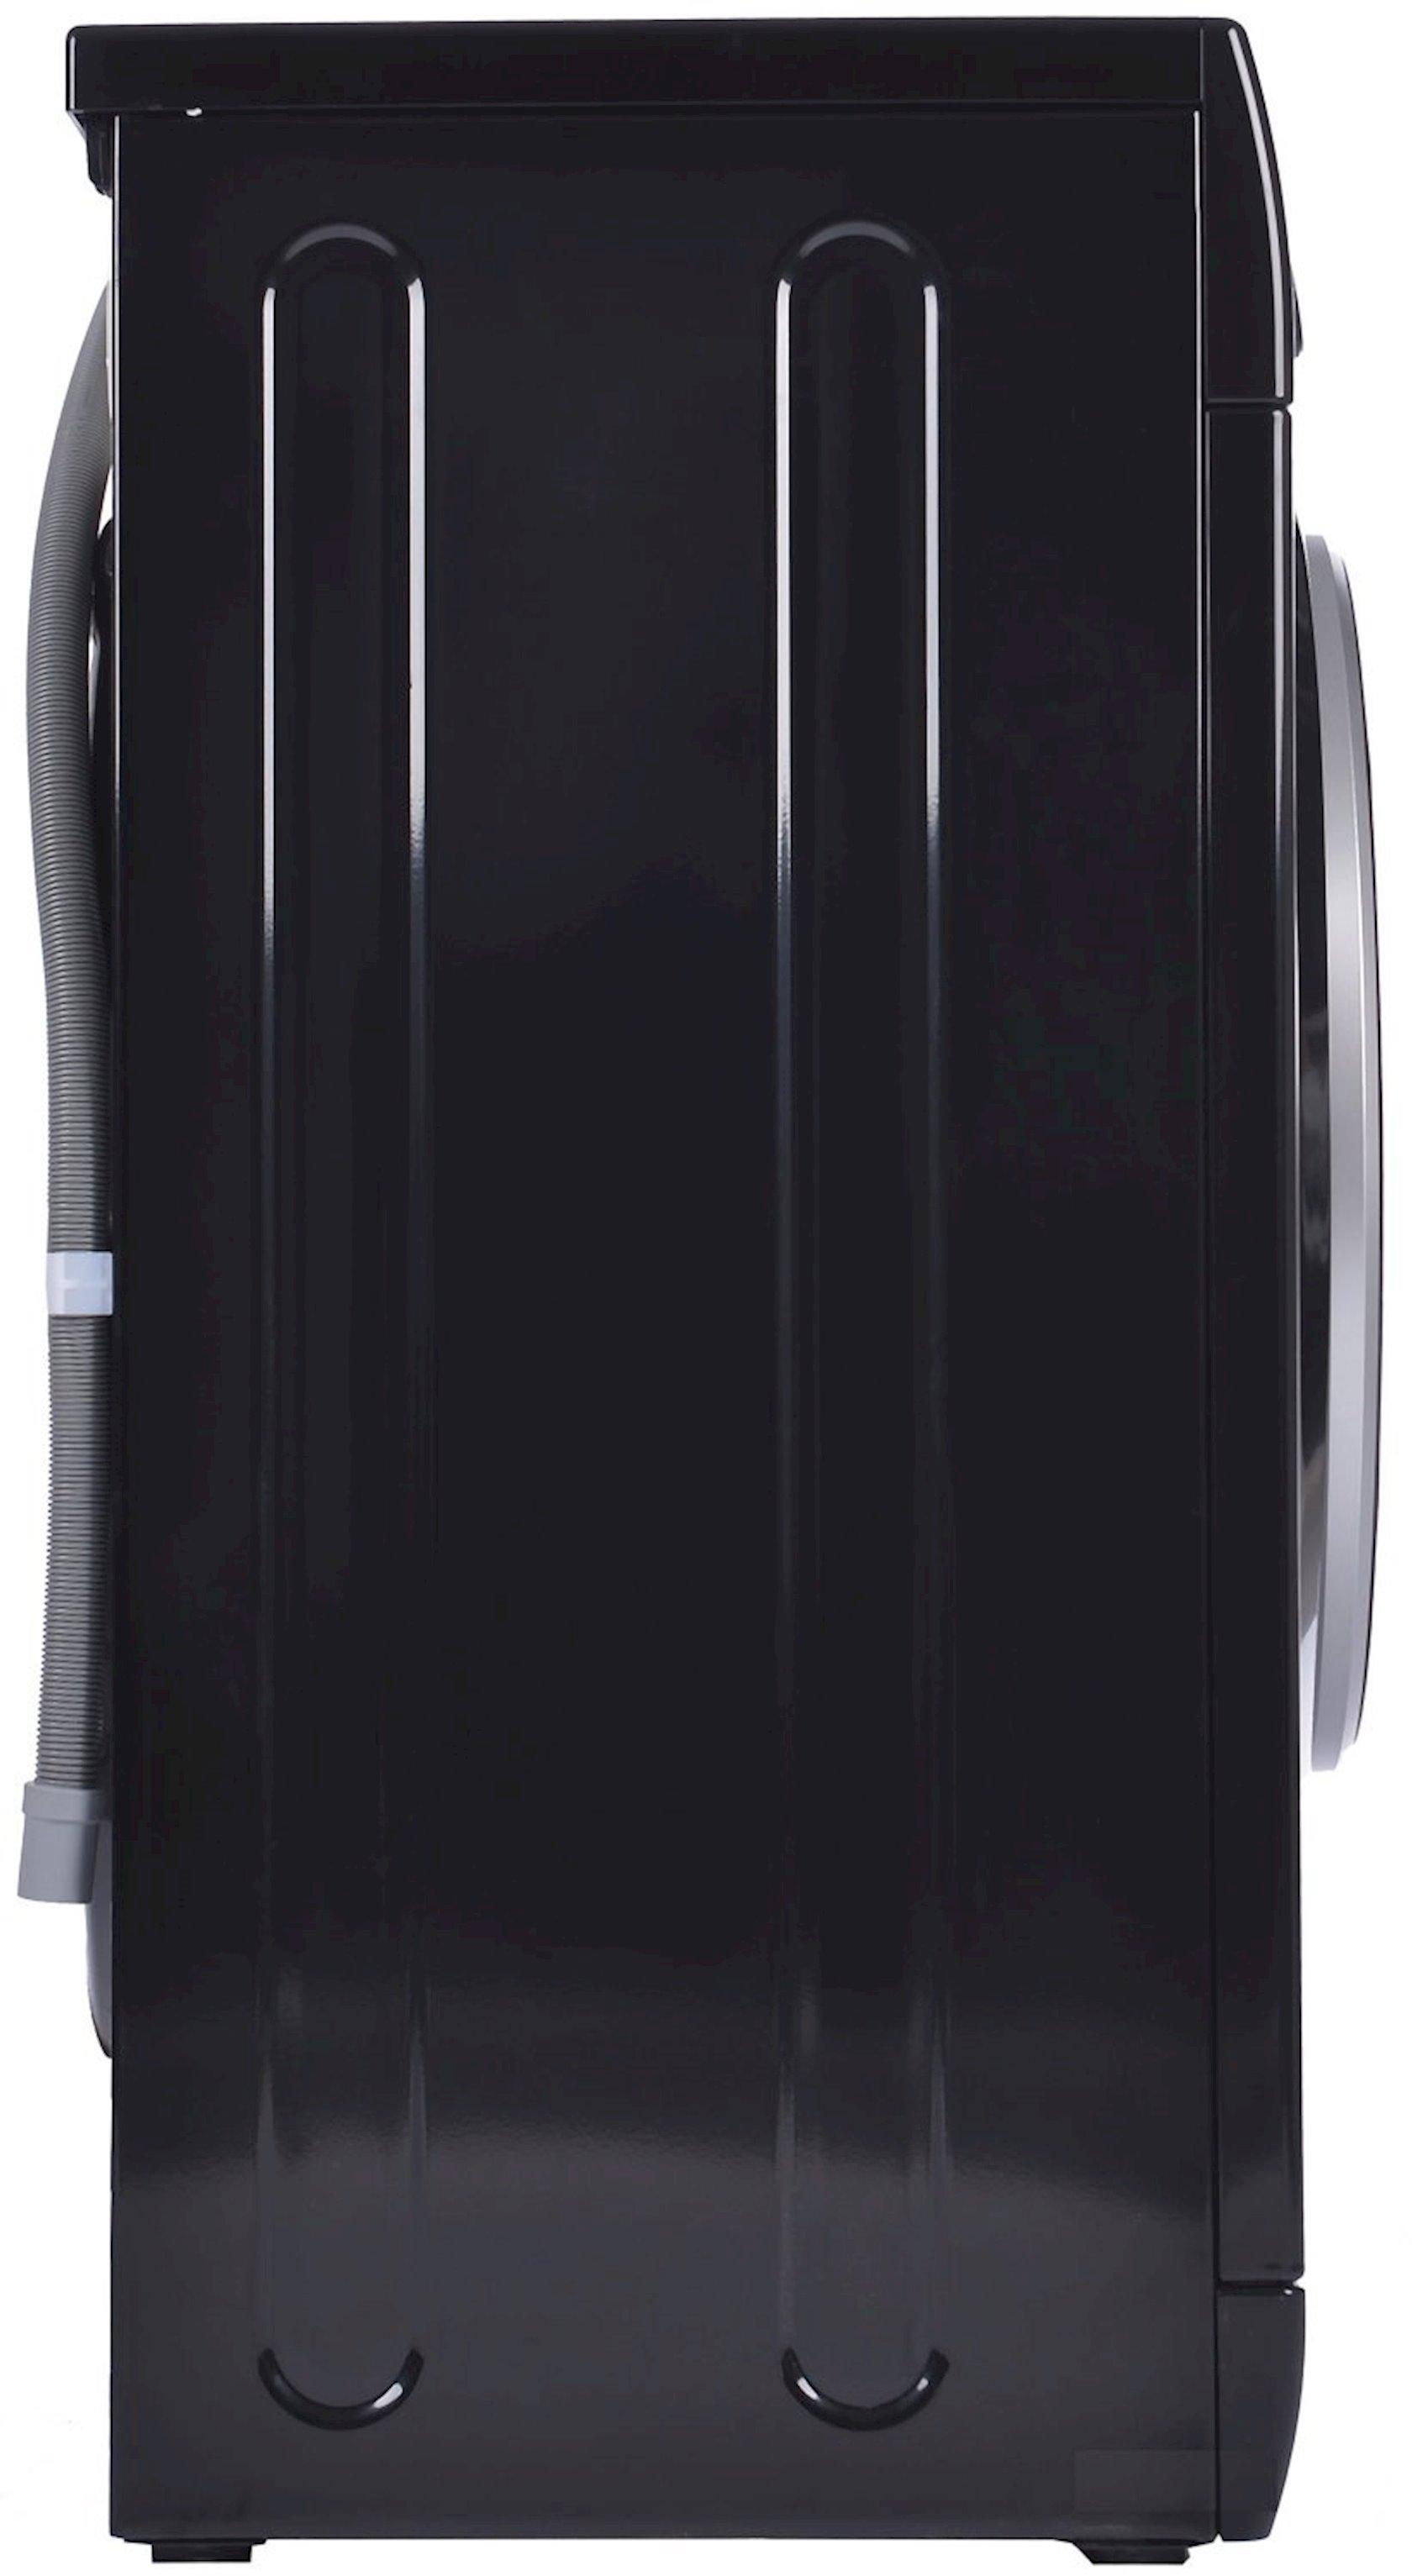 Paltaryuyan maşın Hotpoint-Ariston RSPG 623 KD